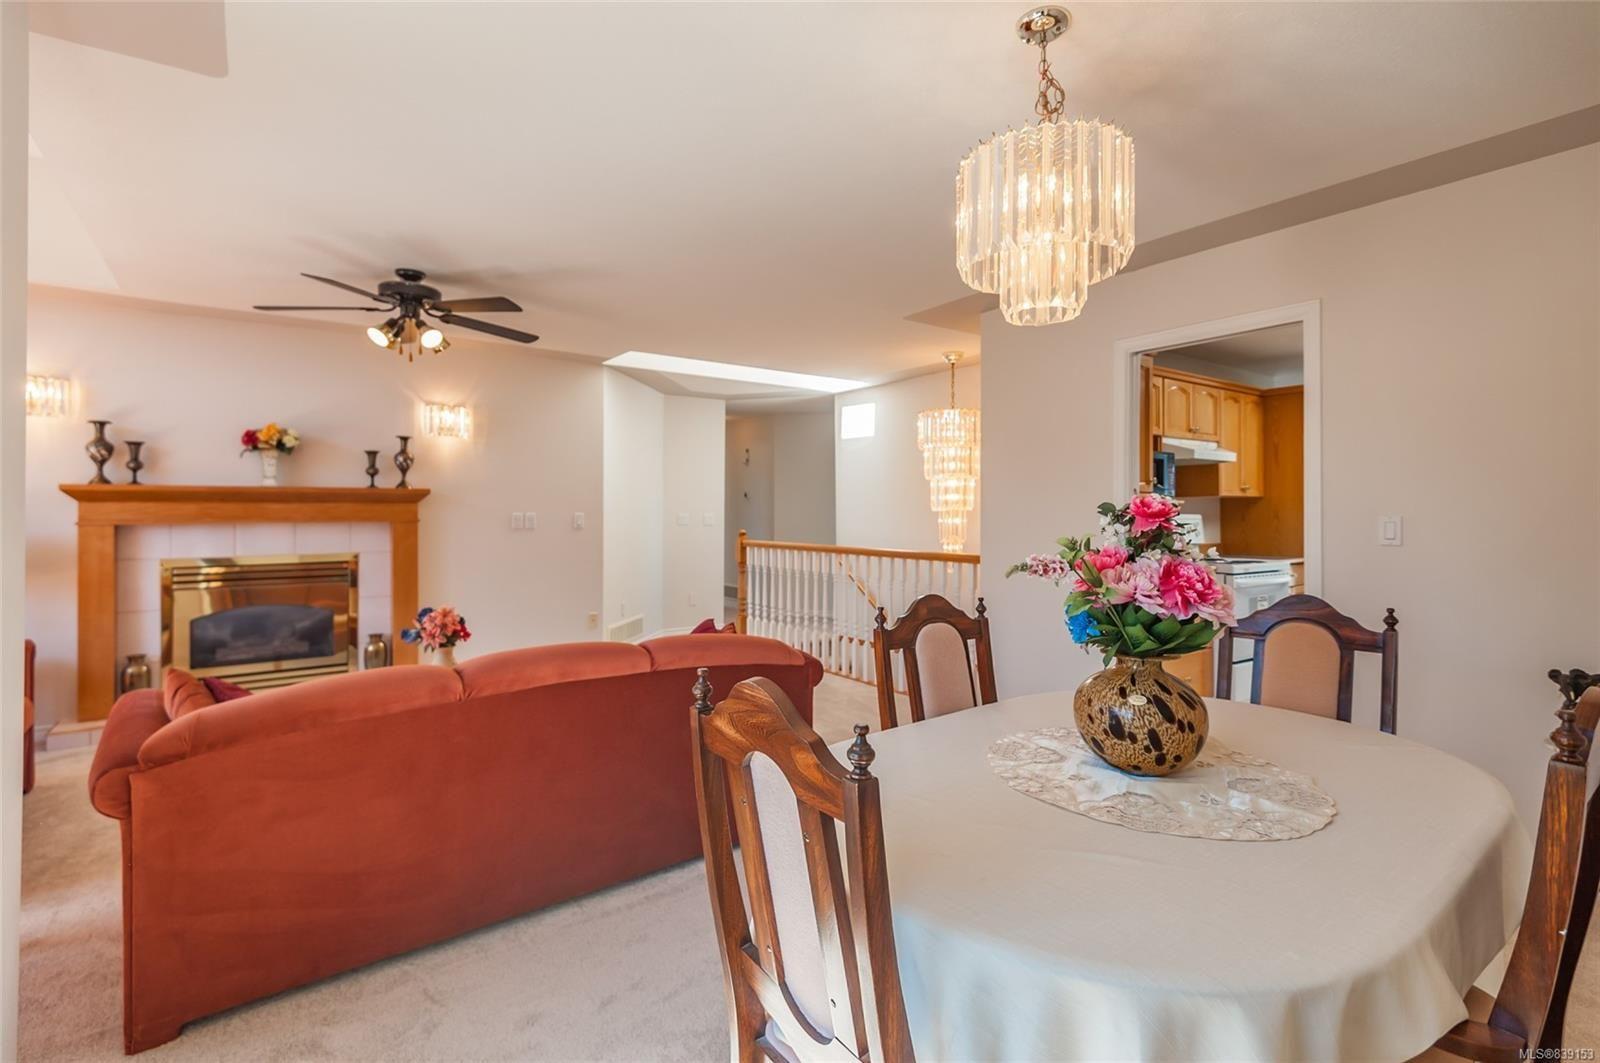 Photo 20: Photos: 6412 Dover Rd in NANAIMO: Na North Nanaimo House for sale (Nanaimo)  : MLS®# 839153